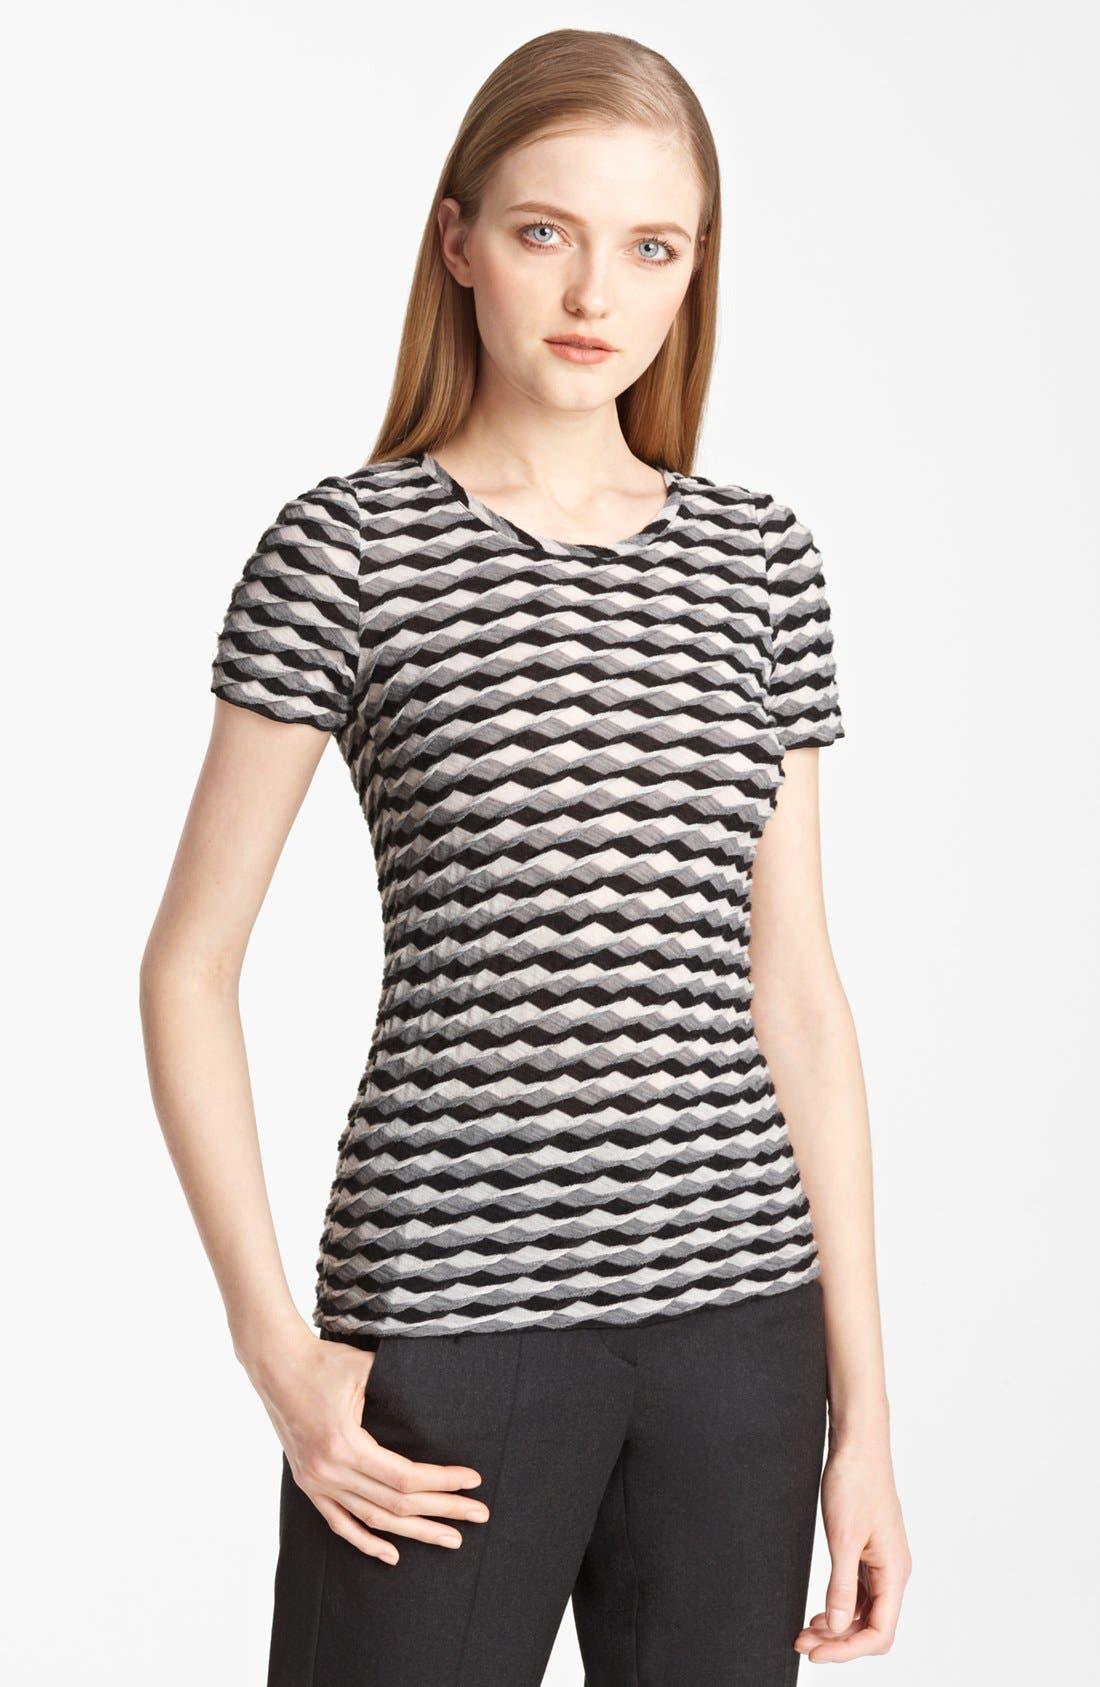 Alternate Image 1 Selected - Armani Collezioni Geometric Wave Knit Jersey Top